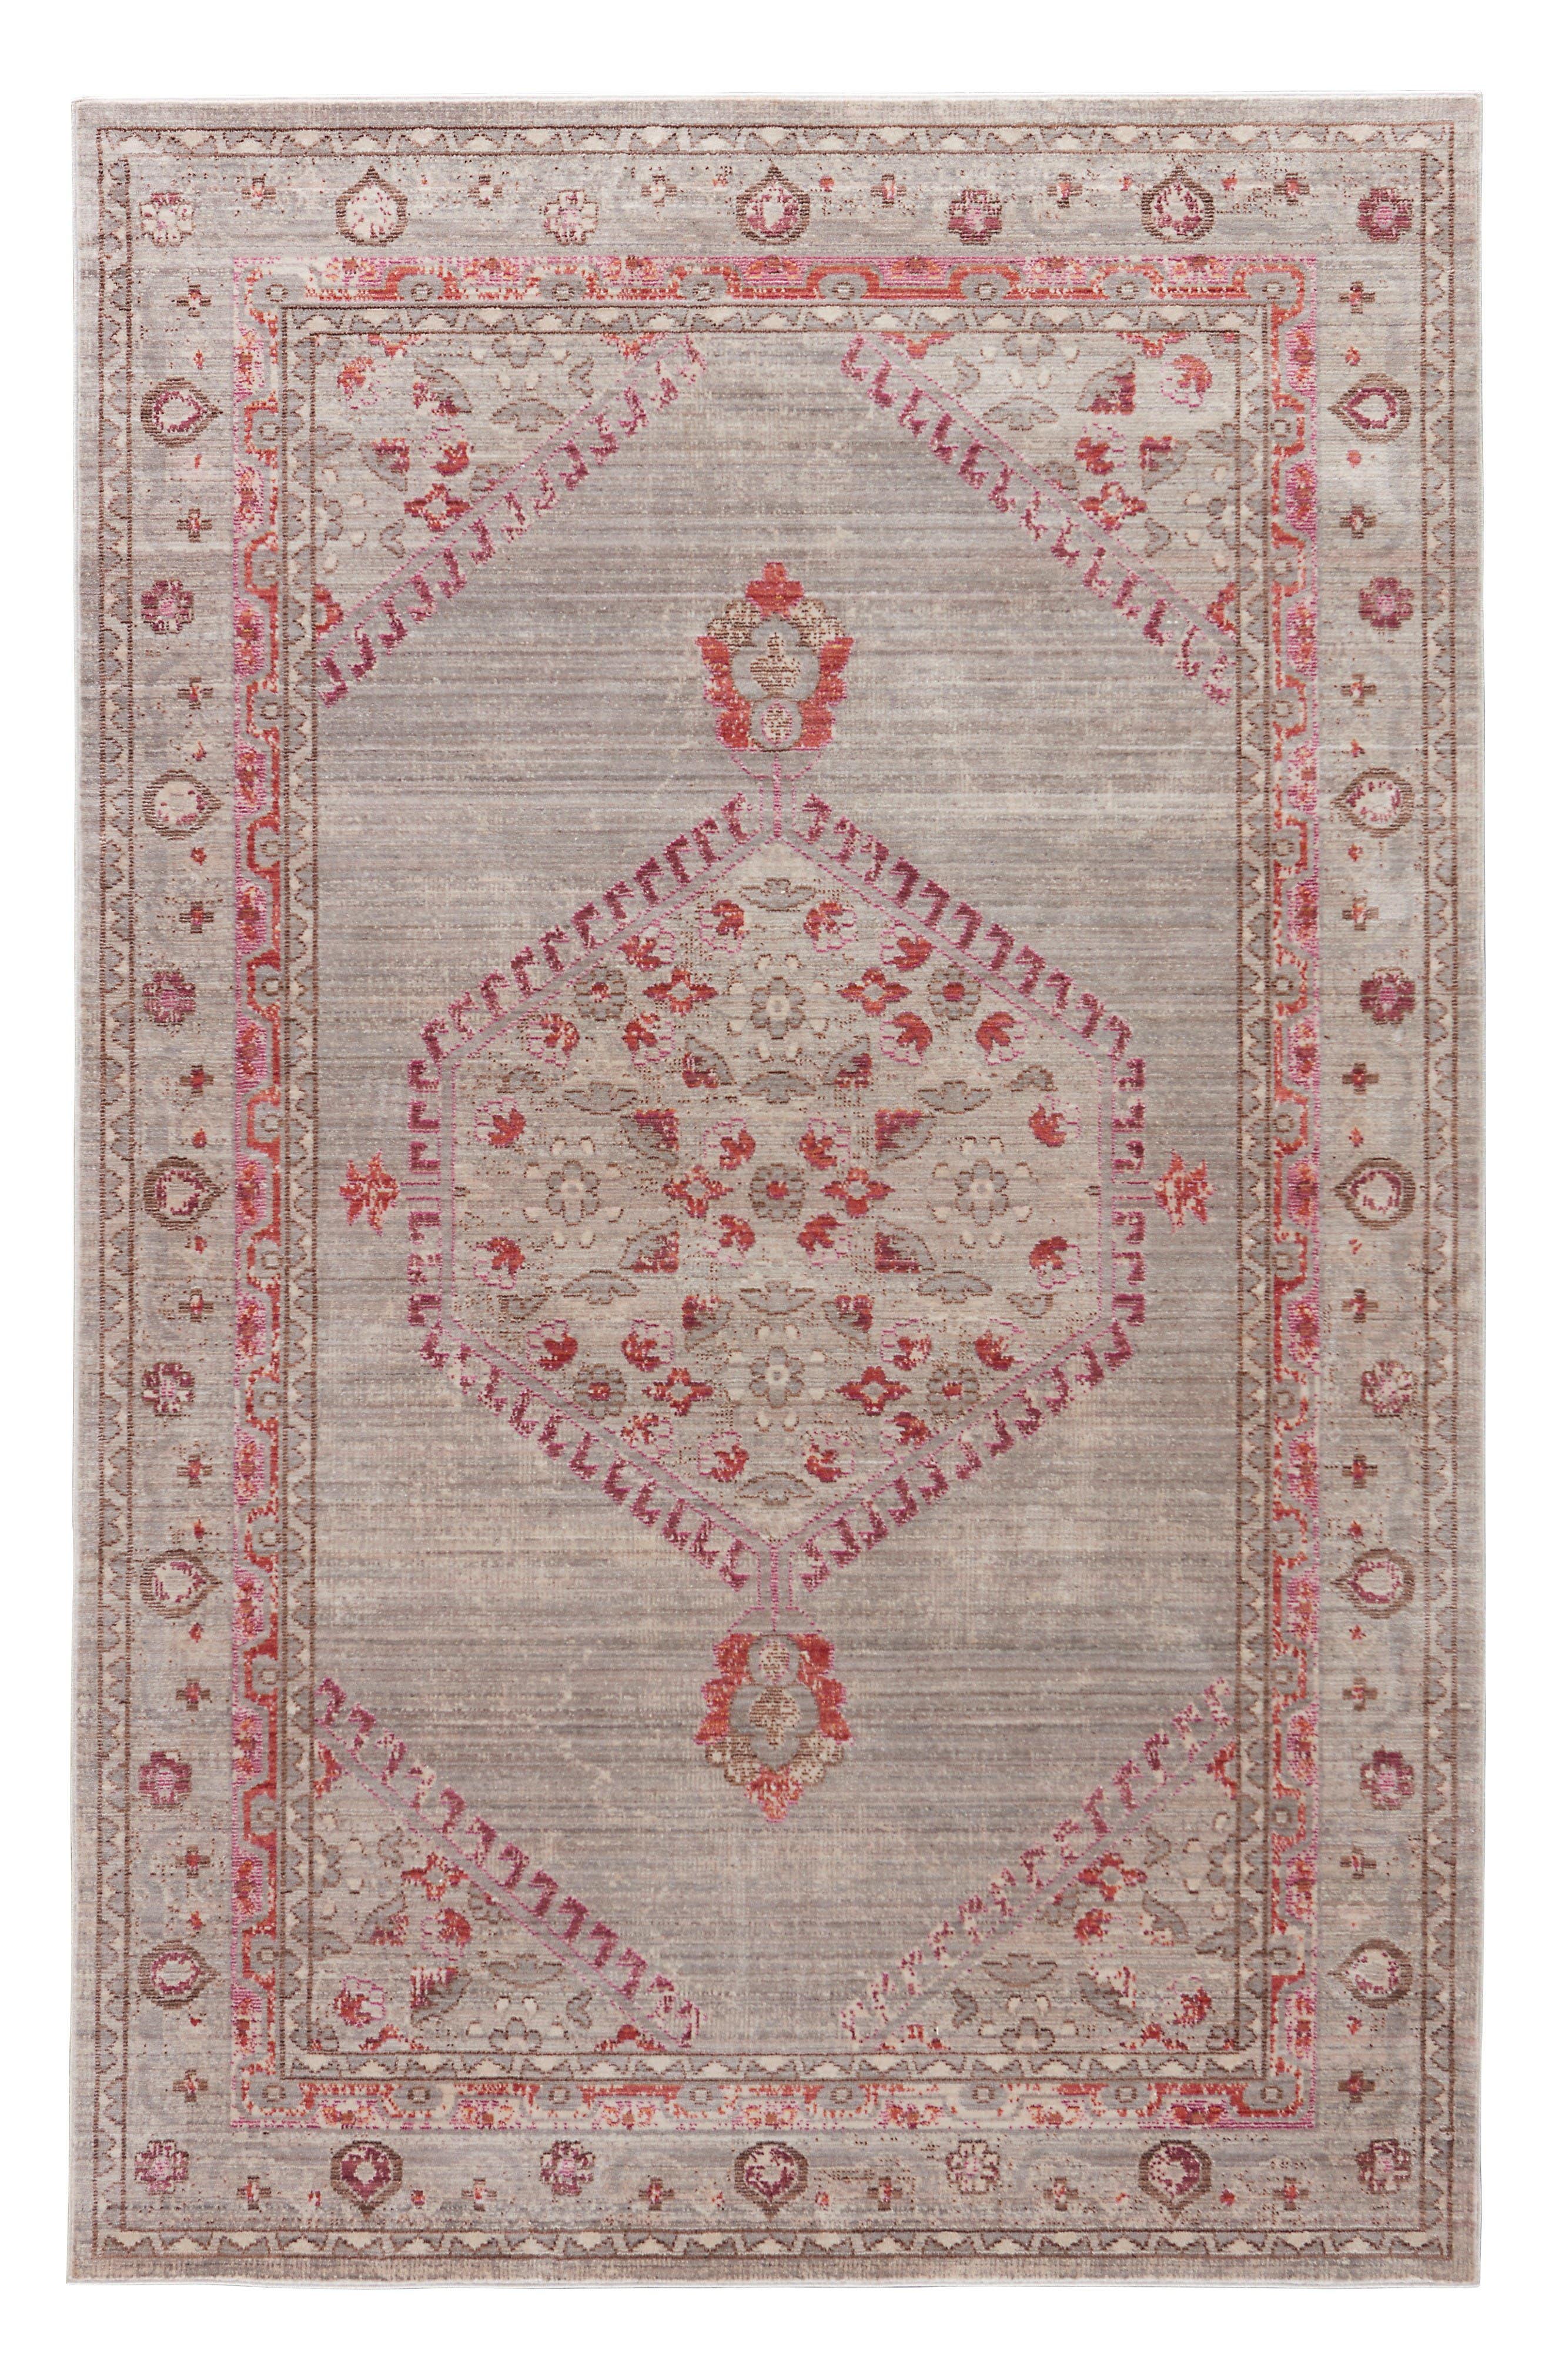 Alternate Image 1 Selected - Jaipur Contemporary Vintage Rug